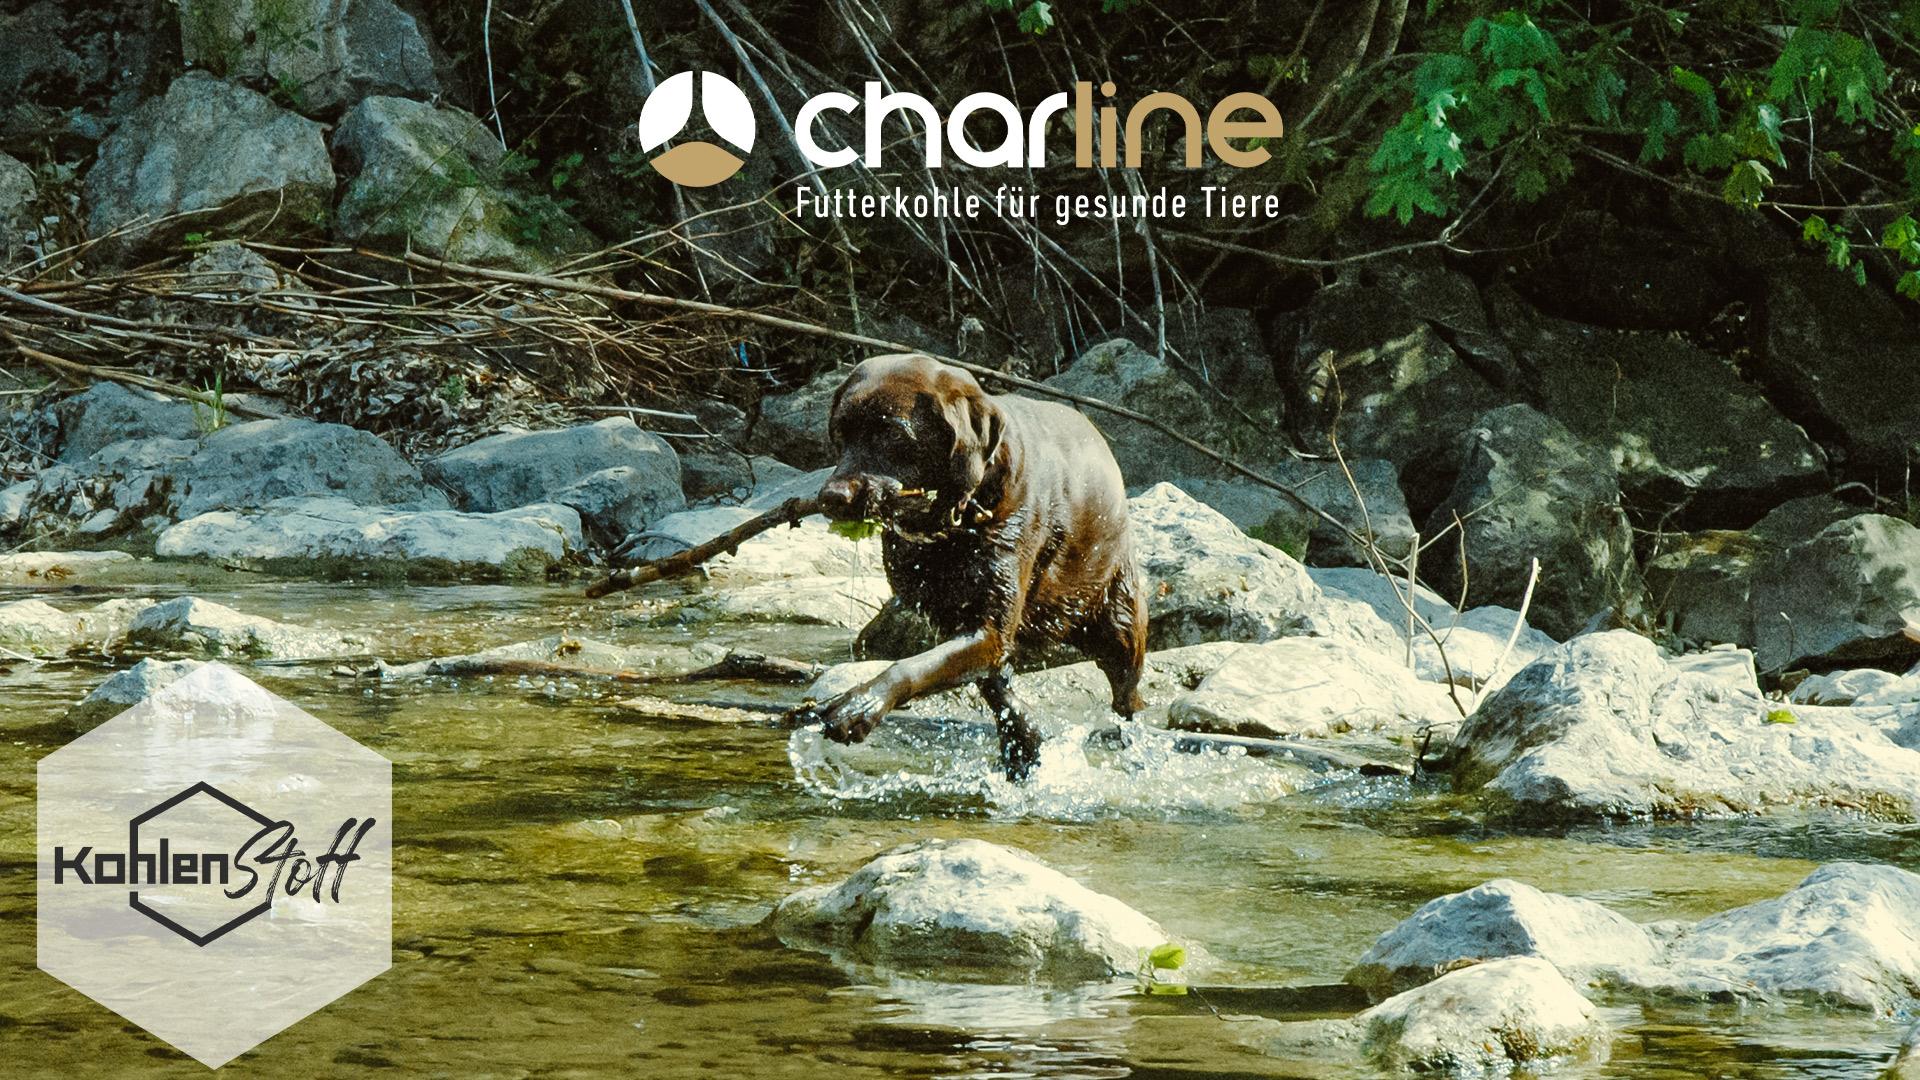 Badespaß mit Hund | KohlenStoff powered by CharLine GmbH